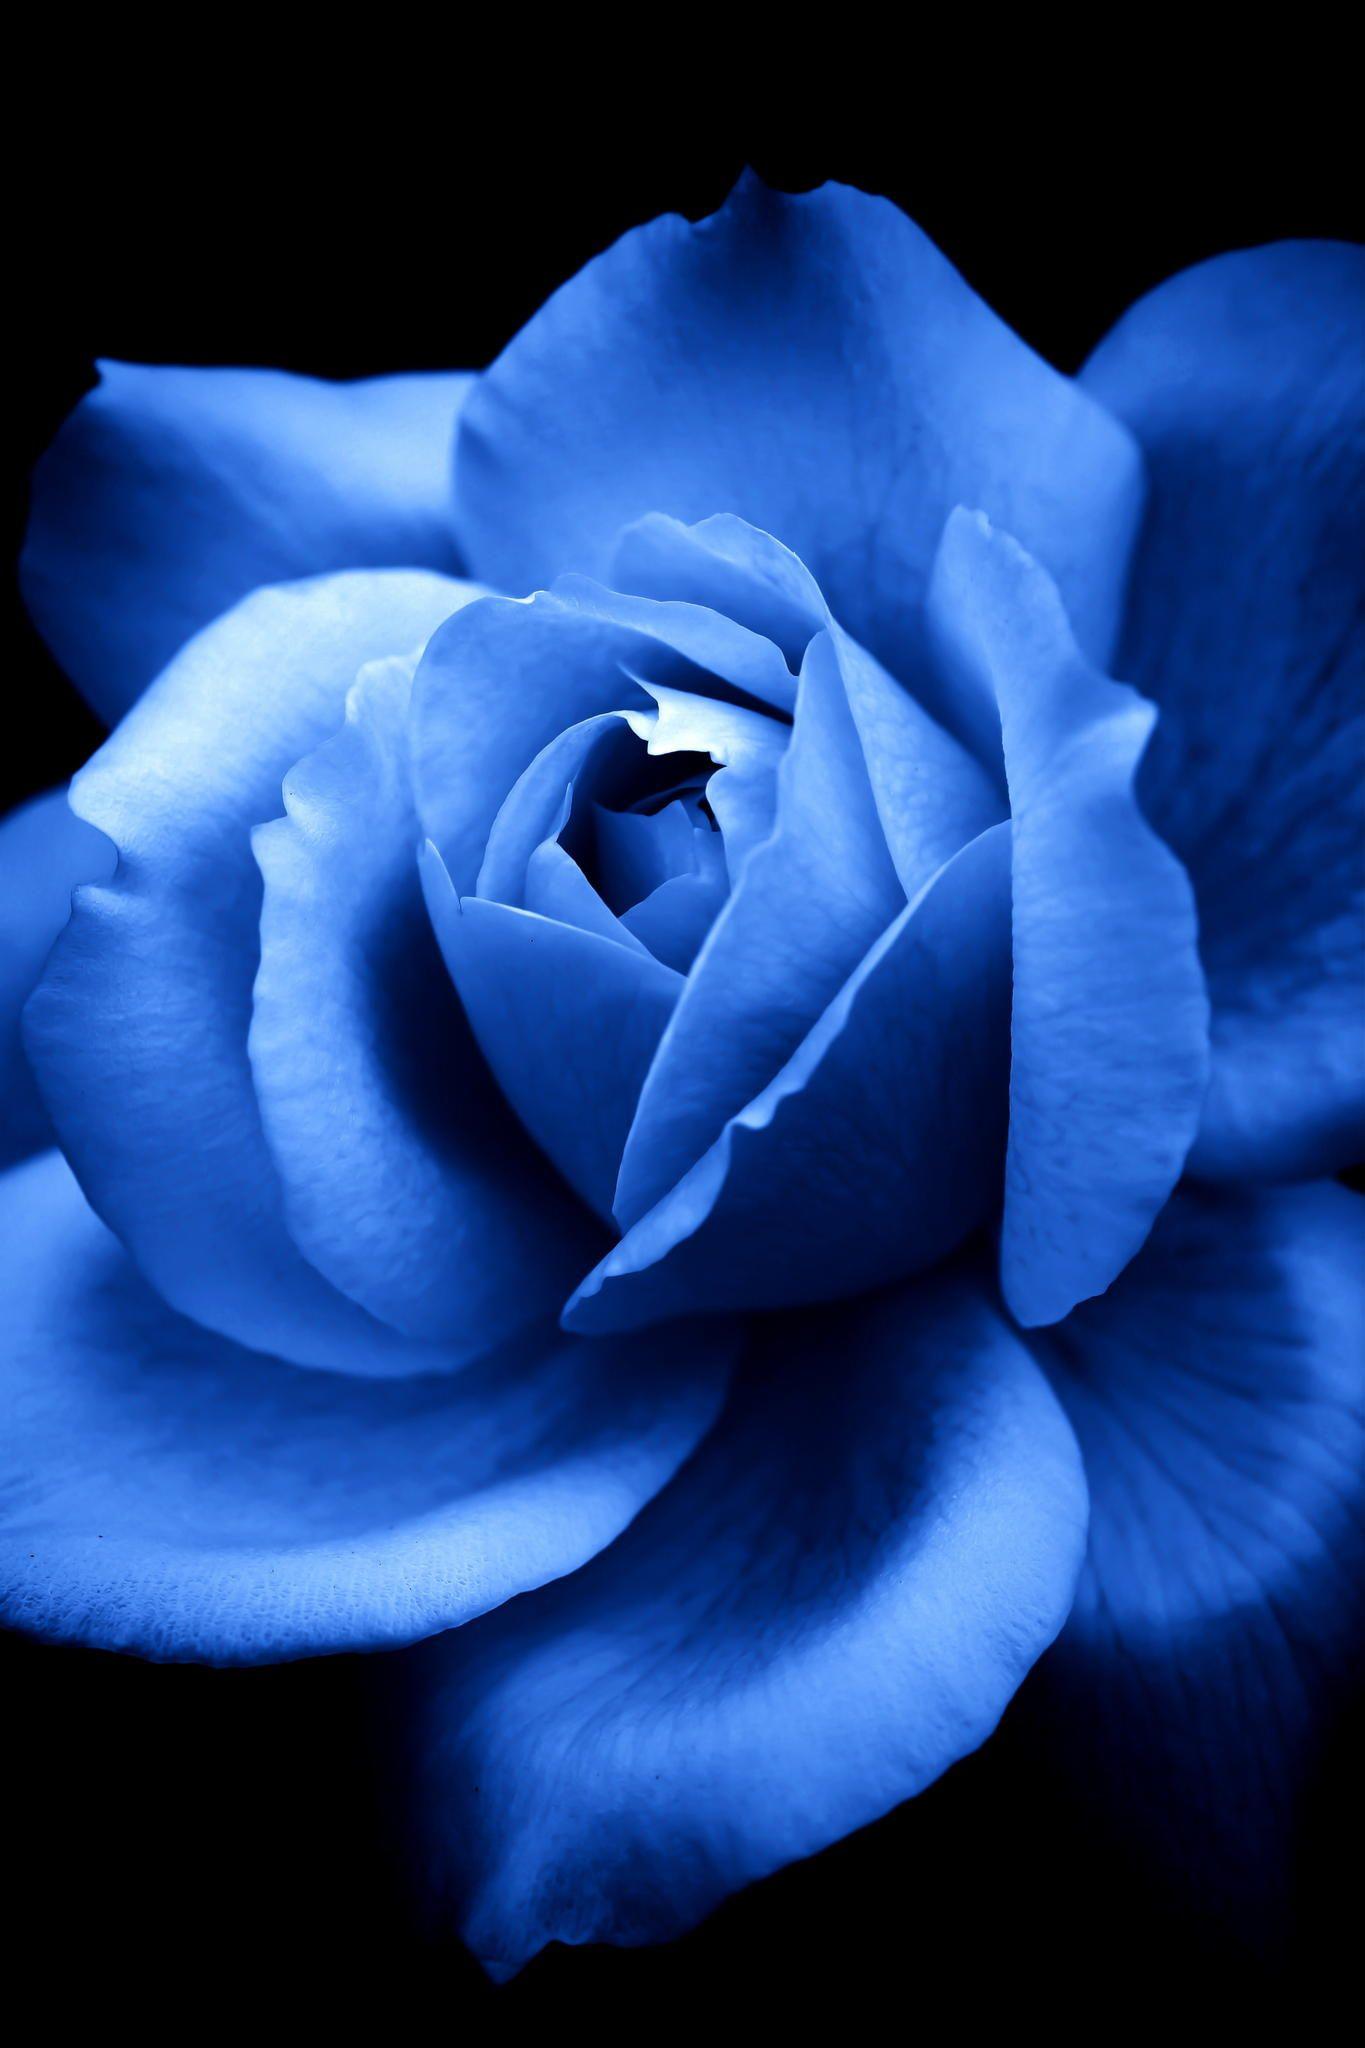 Blue Rose Flowers Pinterest Blue Roses Rose And Flowers